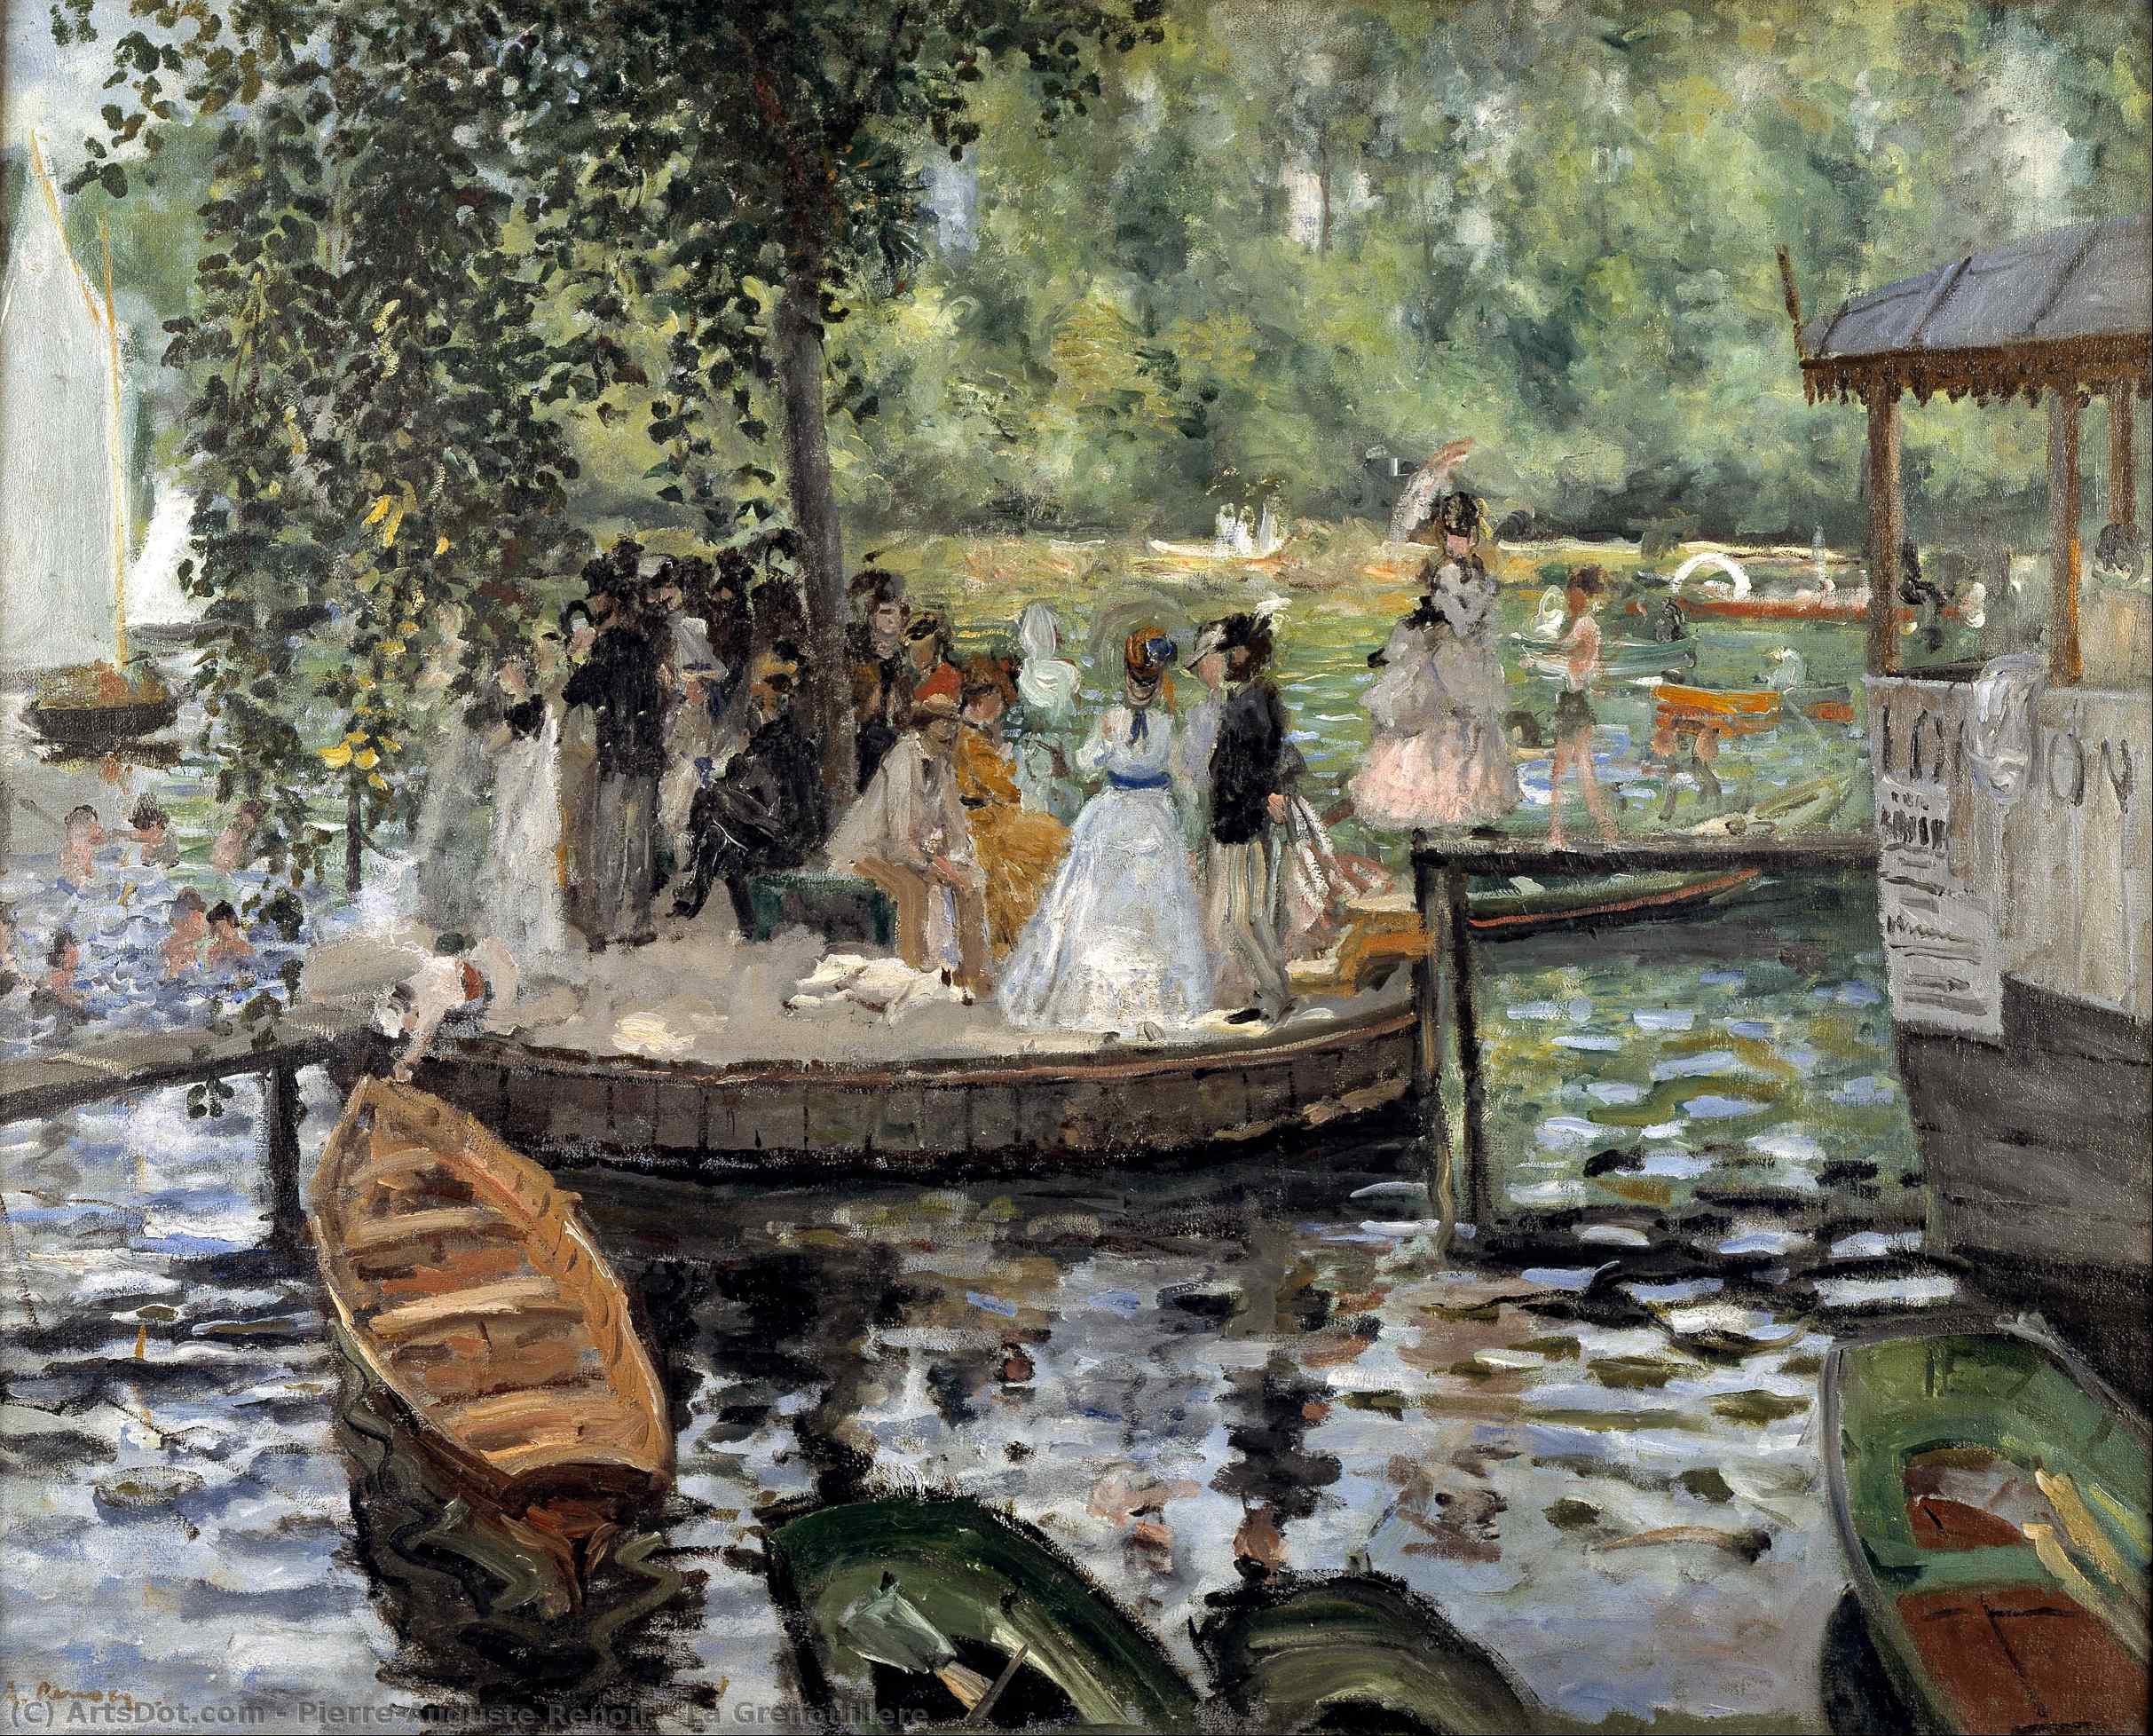 Wikoo.org - موسوعة الفنون الجميلة - اللوحة، العمل الفني Pierre-Auguste Renoir - La Grenouillere